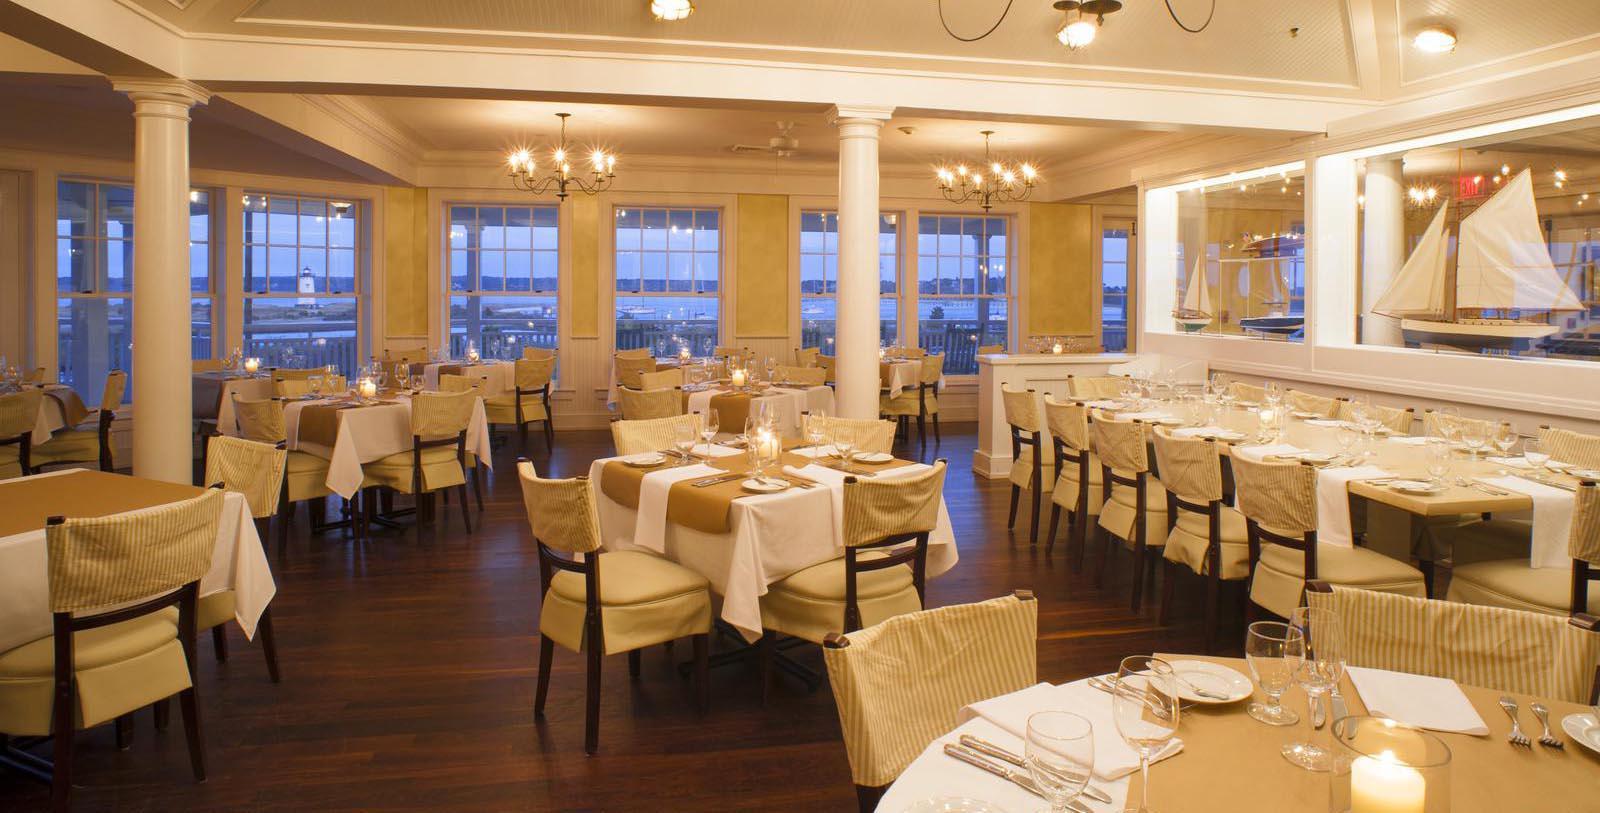 Image of dining room Harbor View Hotel of Martha's Vineyard, 1891, Member of Historic Hotels of America, Edgartown, Massachusetts, Experience